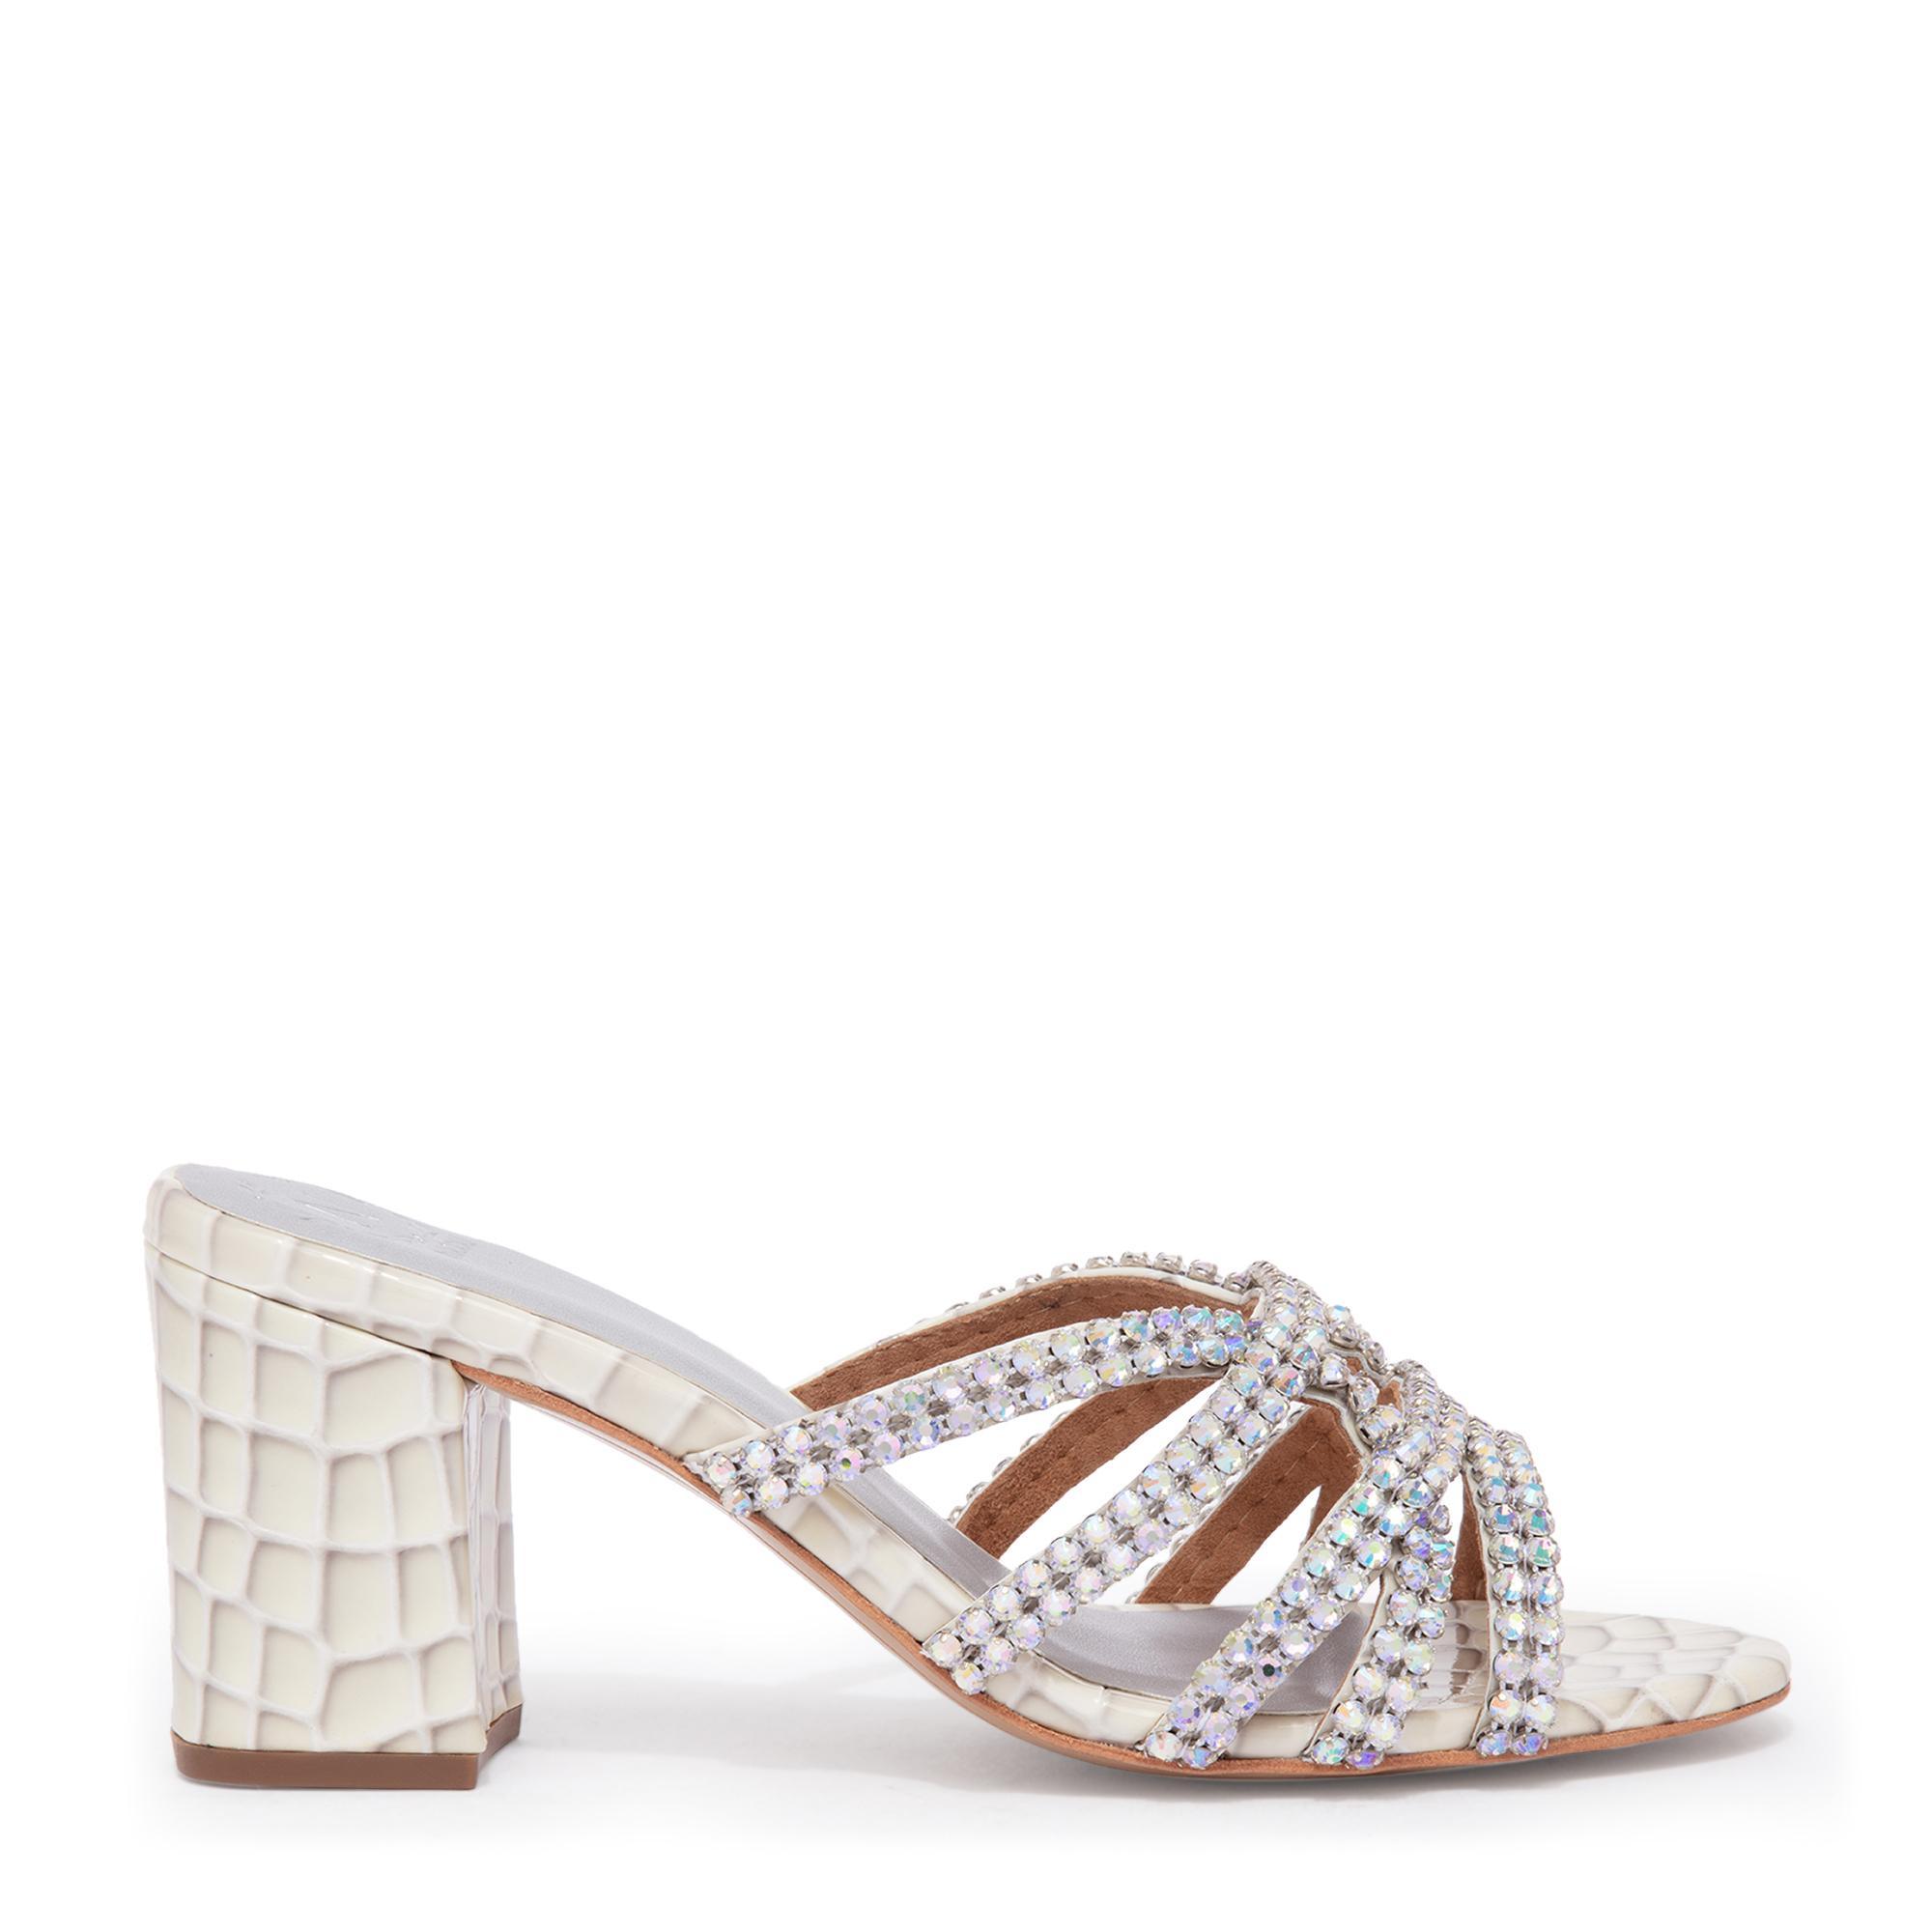 Simone sandals